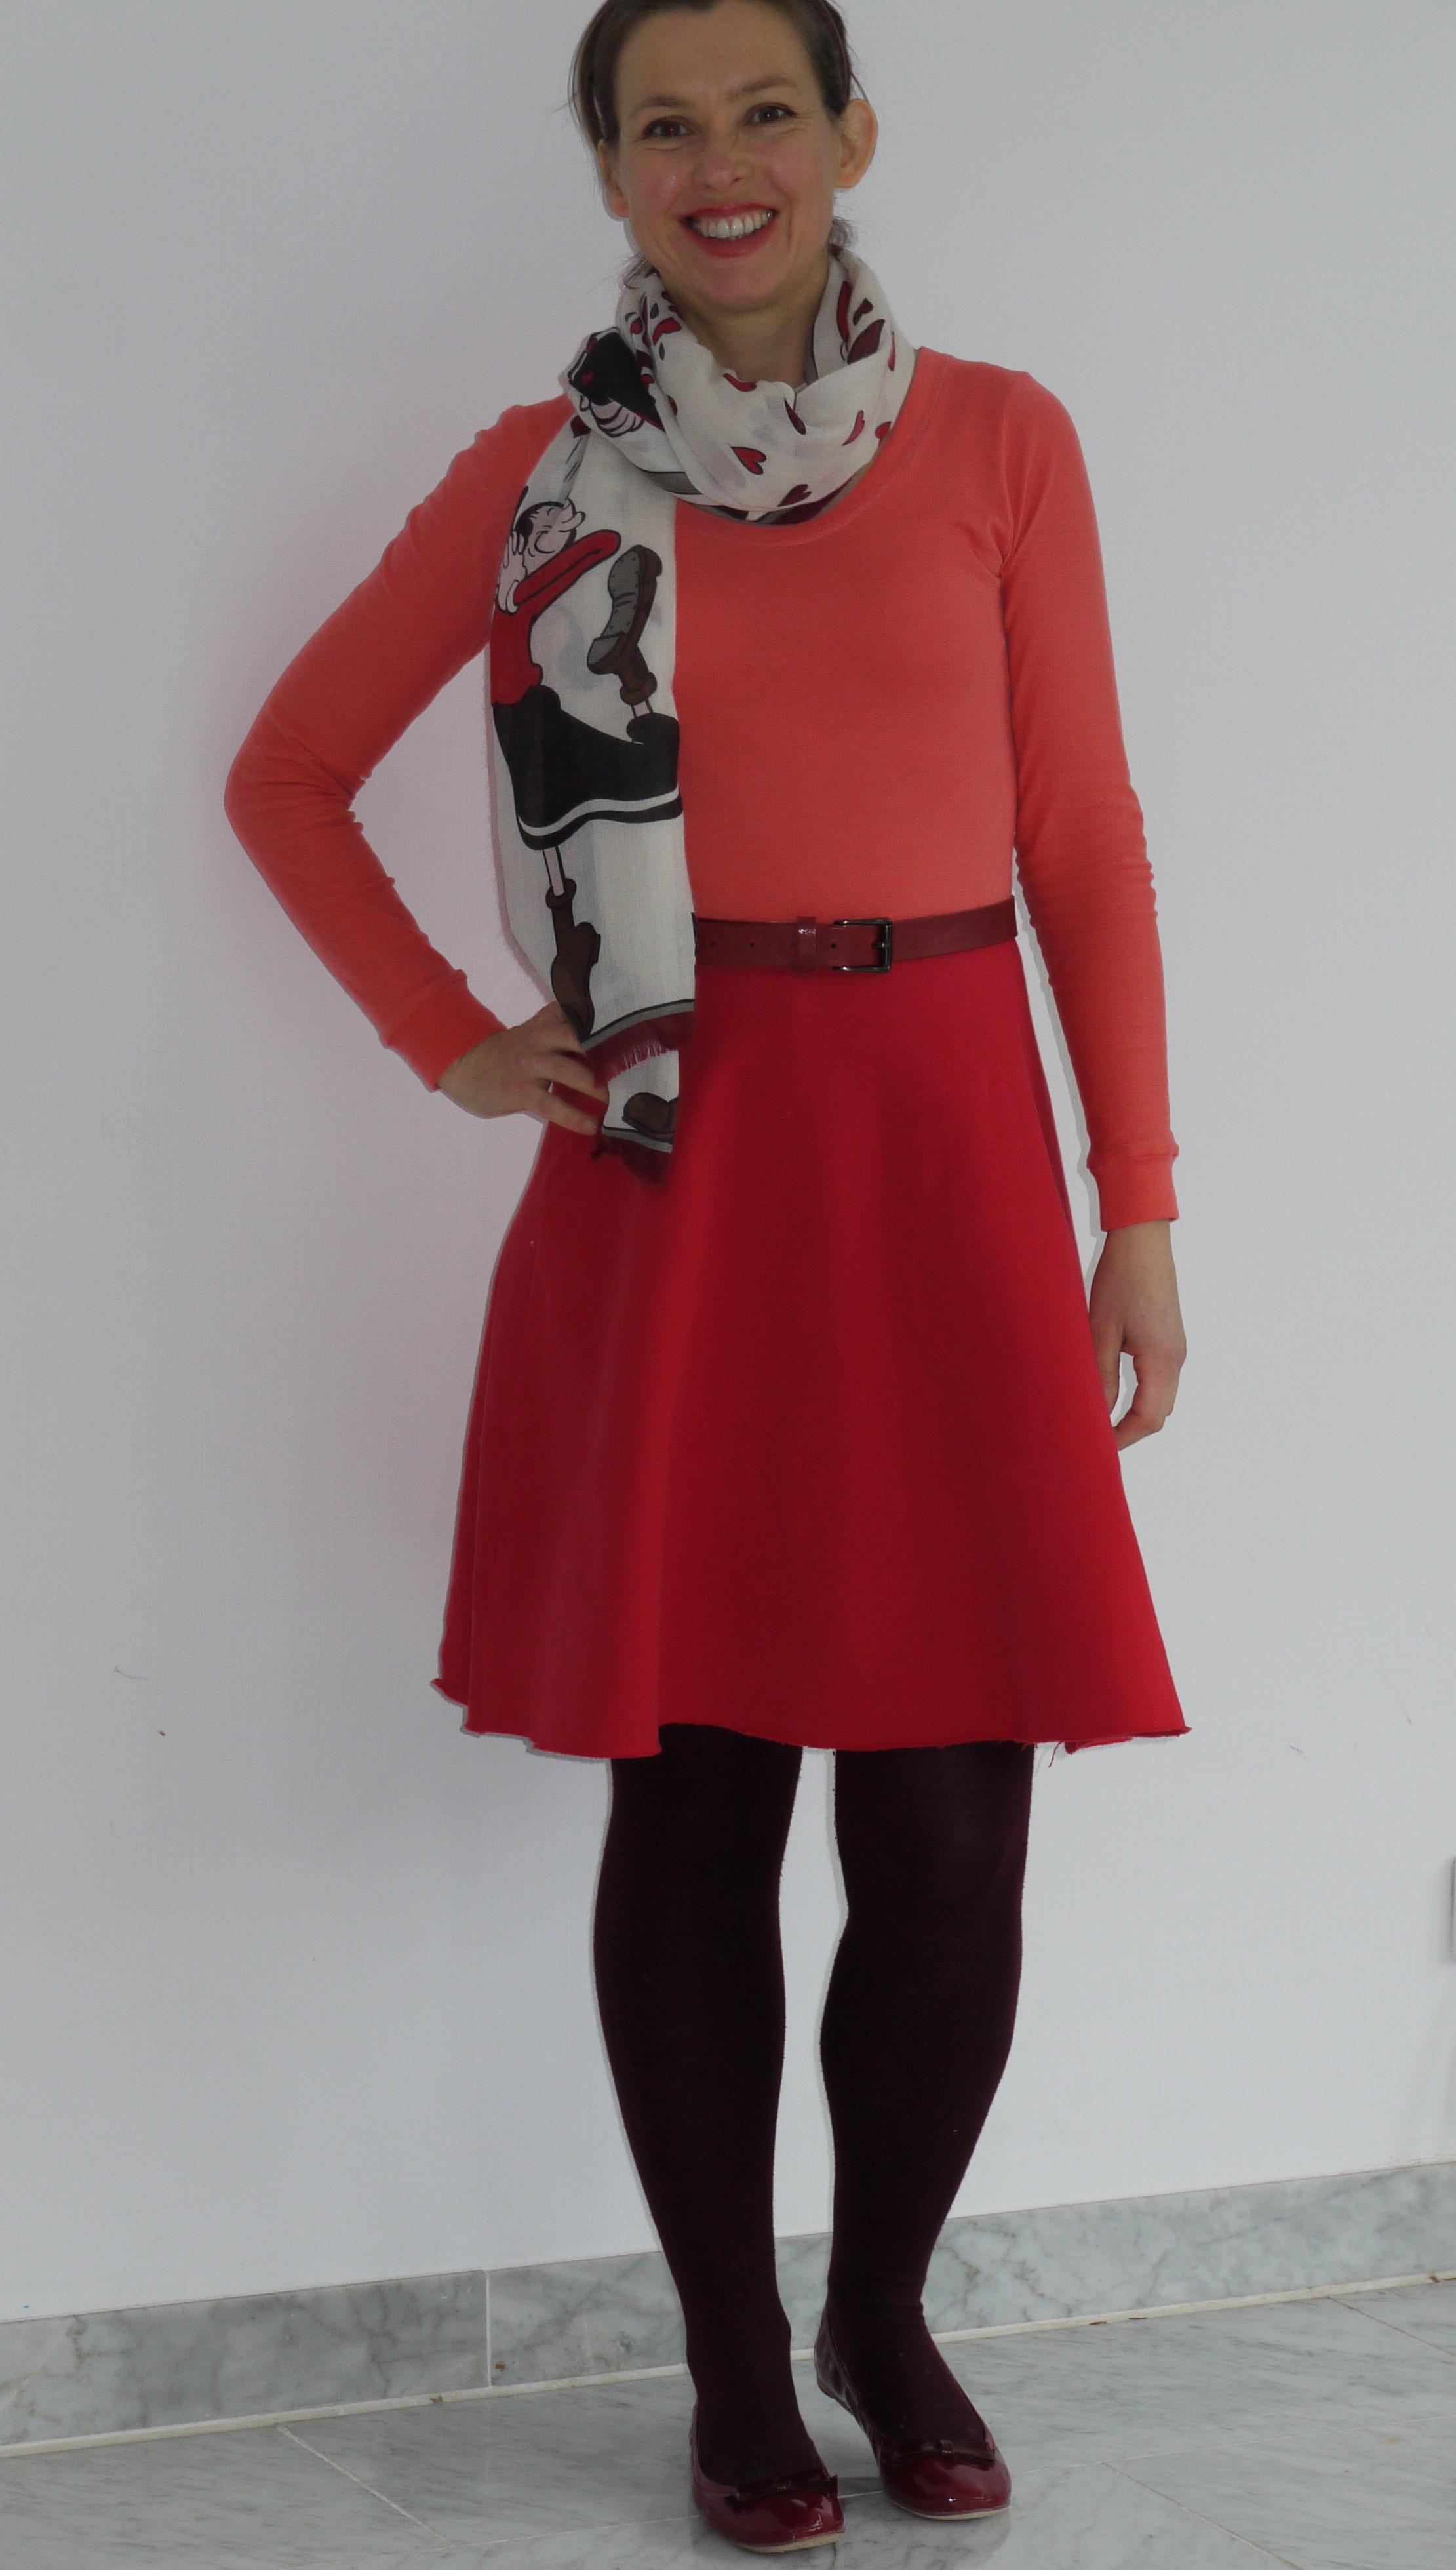 Ichy Coo Lady Skater dress